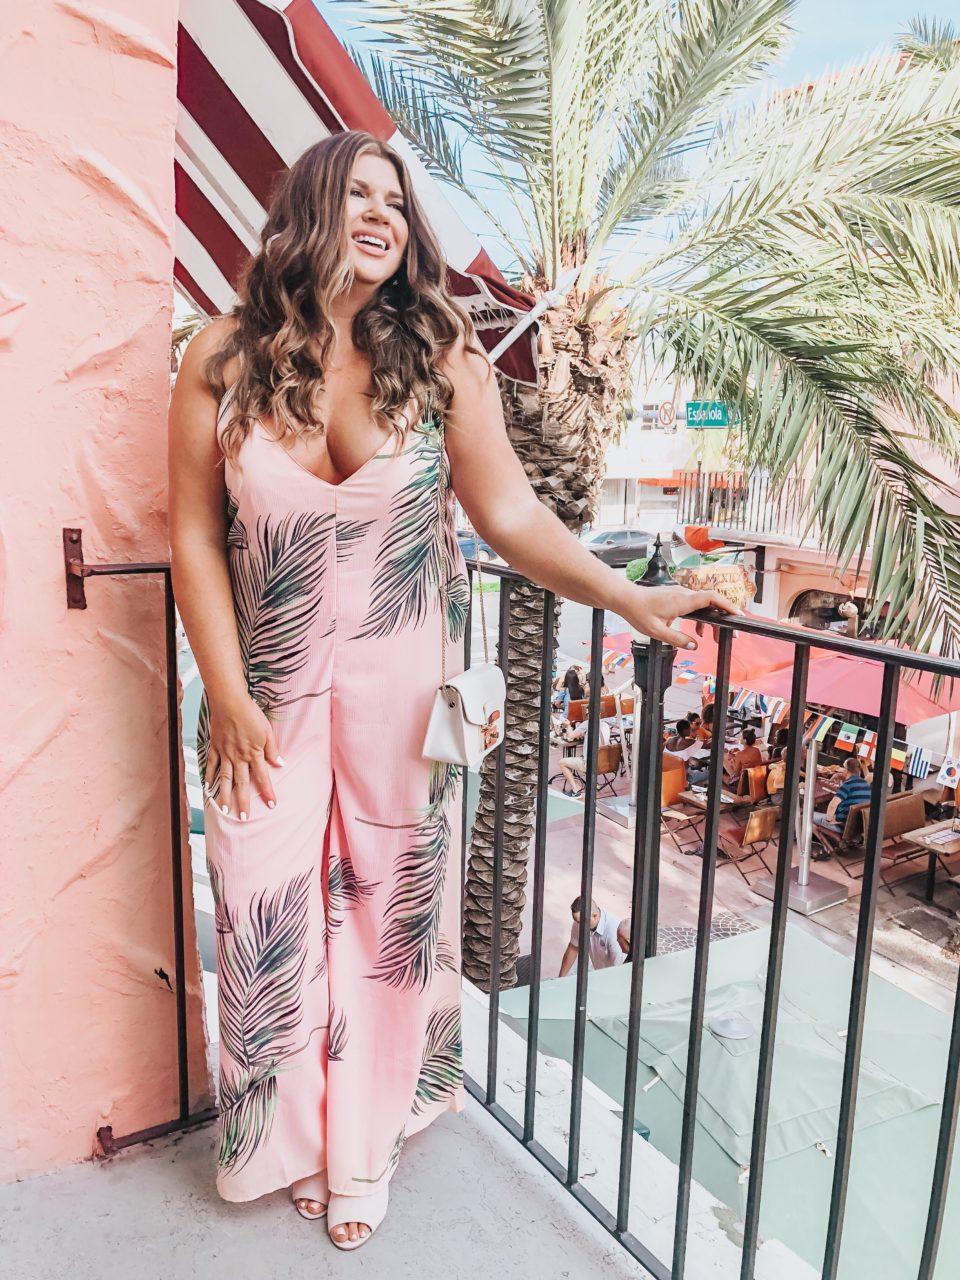 On Espanola Way - South Beach Miami - Pink Palm Jumpsuit